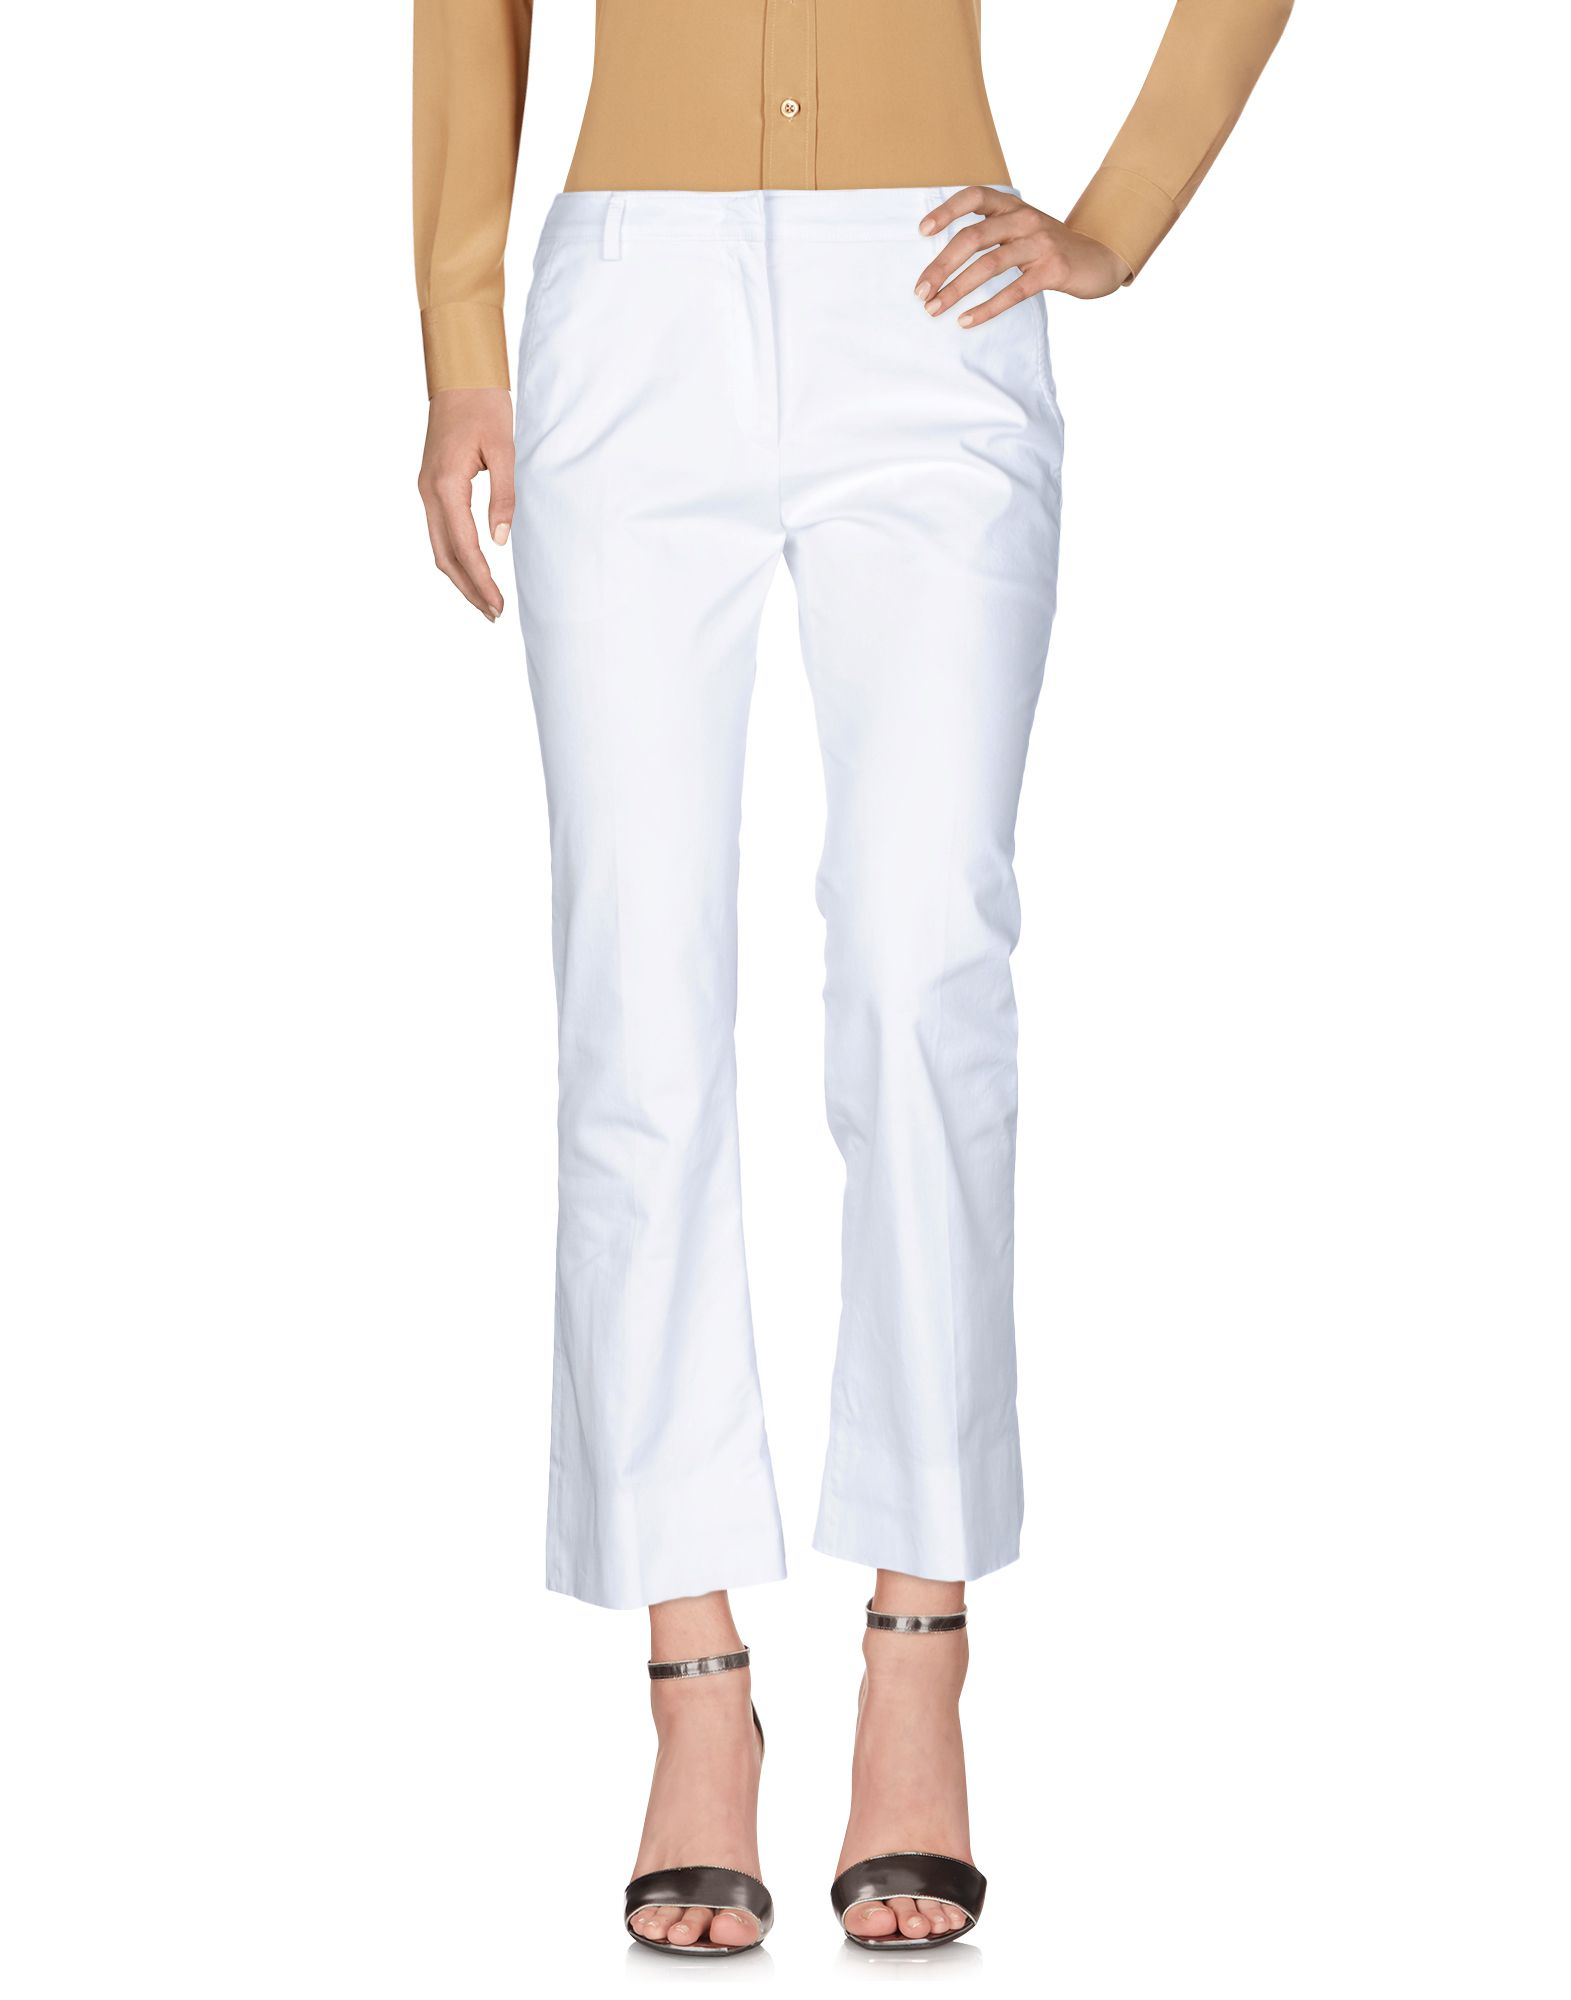 Pantalone Prada Donna - Acquista online su pQ0guiGq